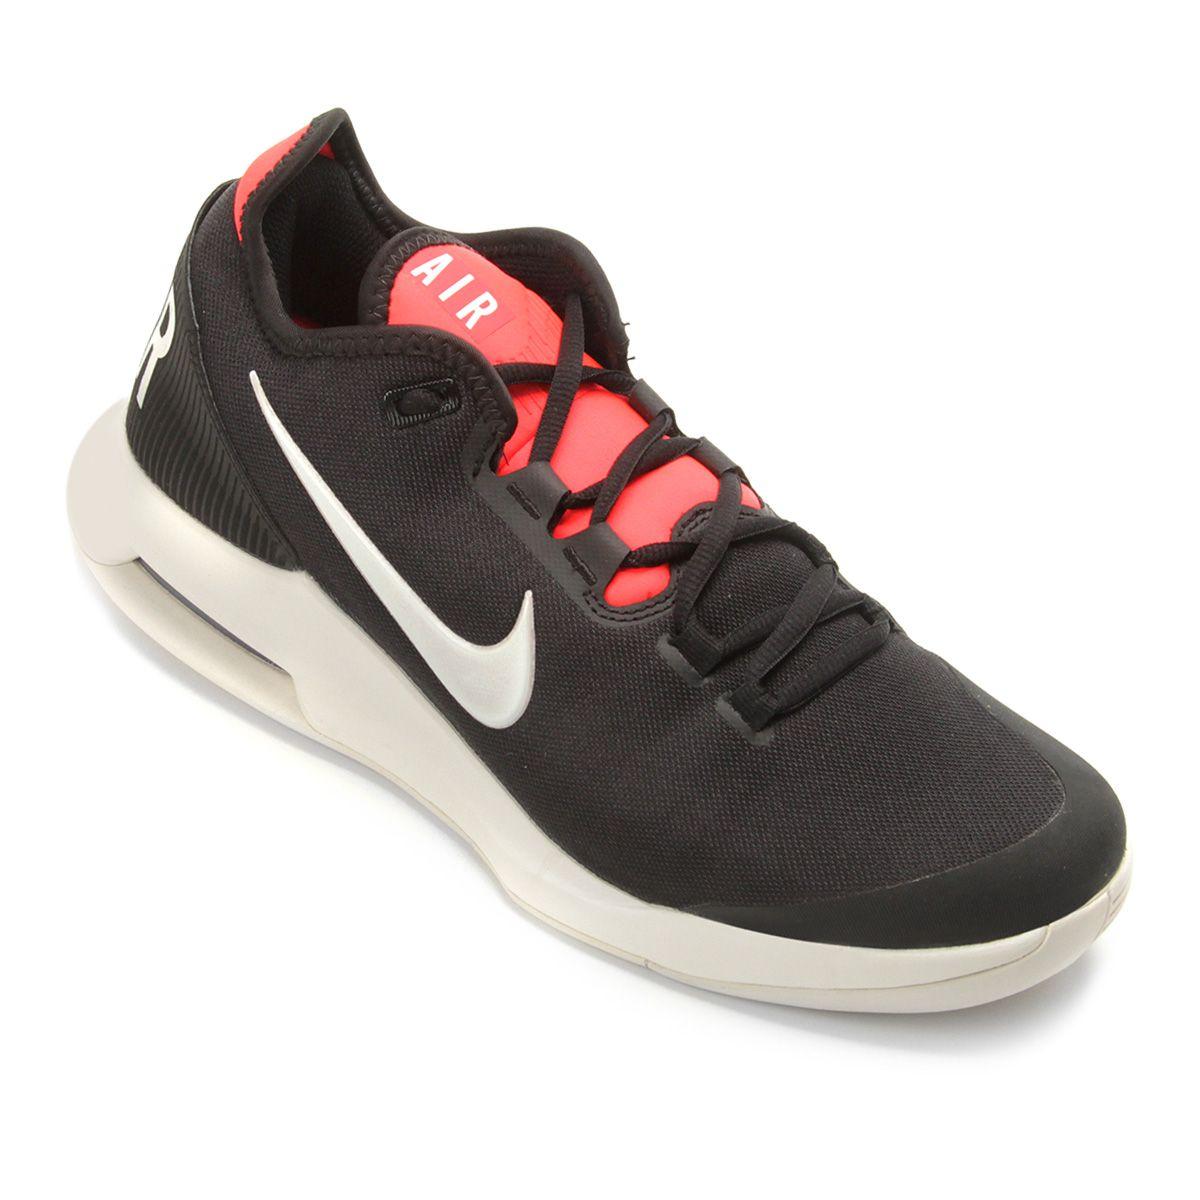 Tenis Nike Wildcard - Ao7351-006